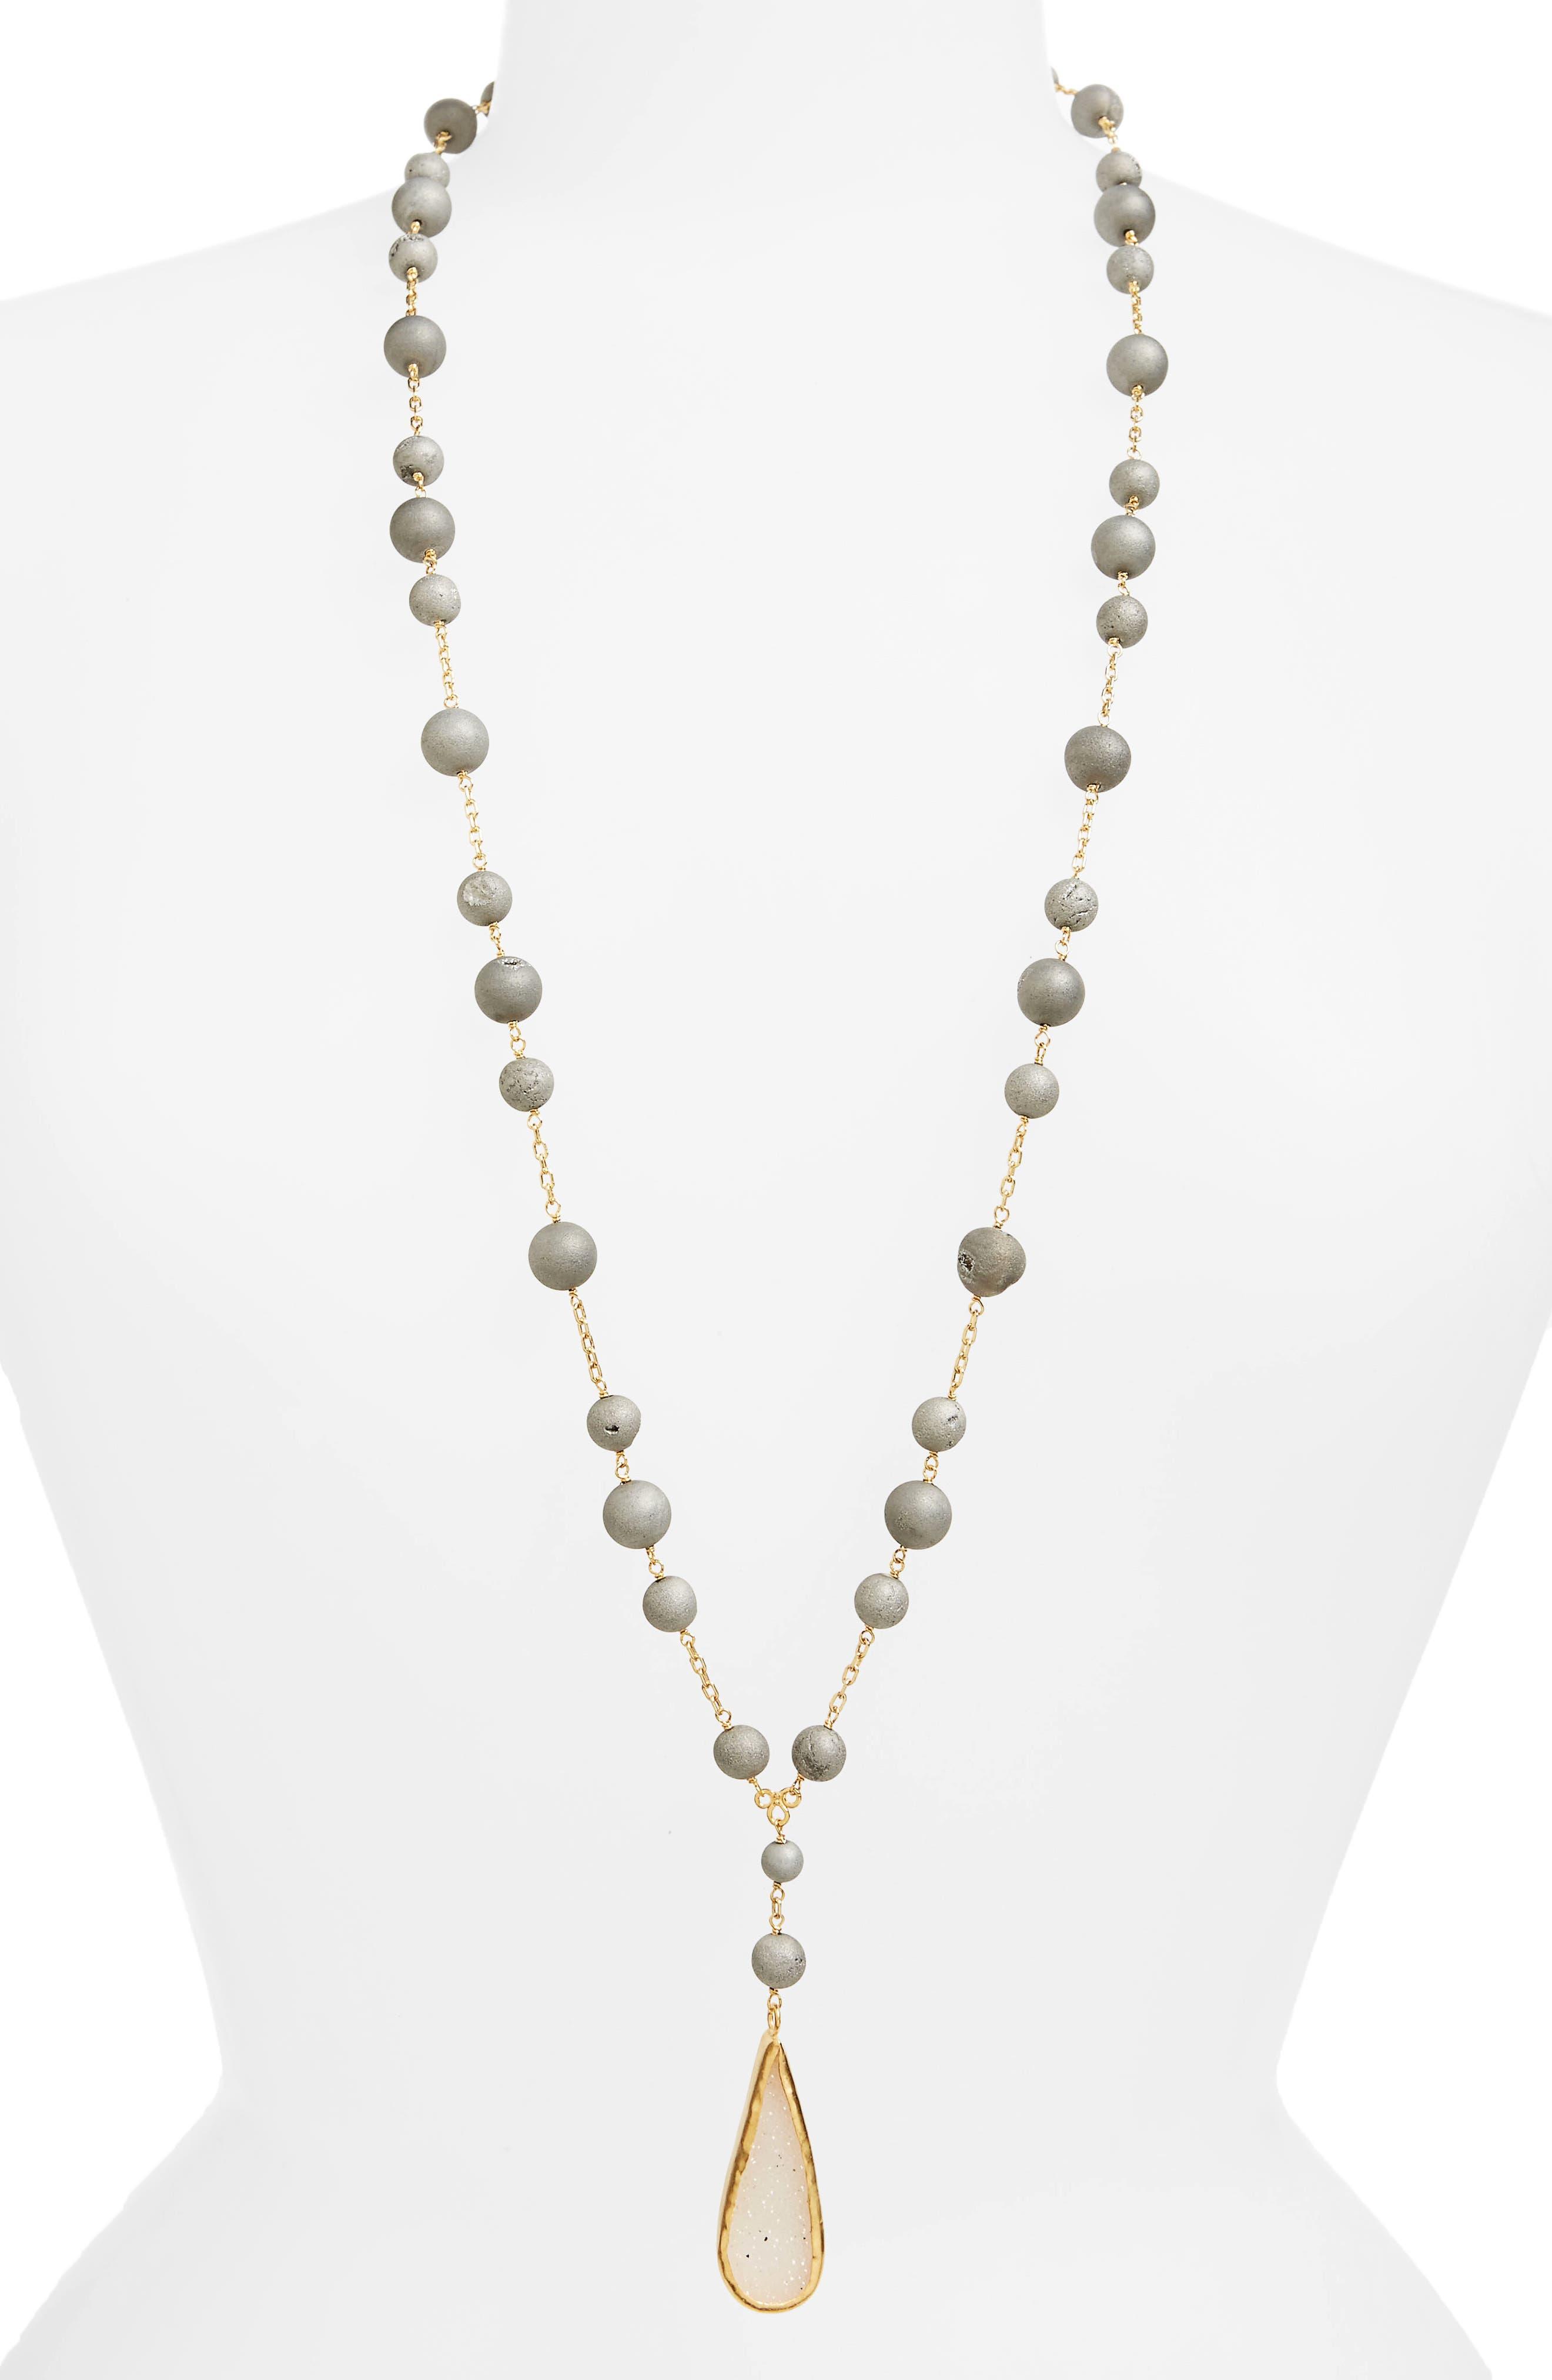 Drusy Agate Pendant Necklace,                             Main thumbnail 1, color,                             040